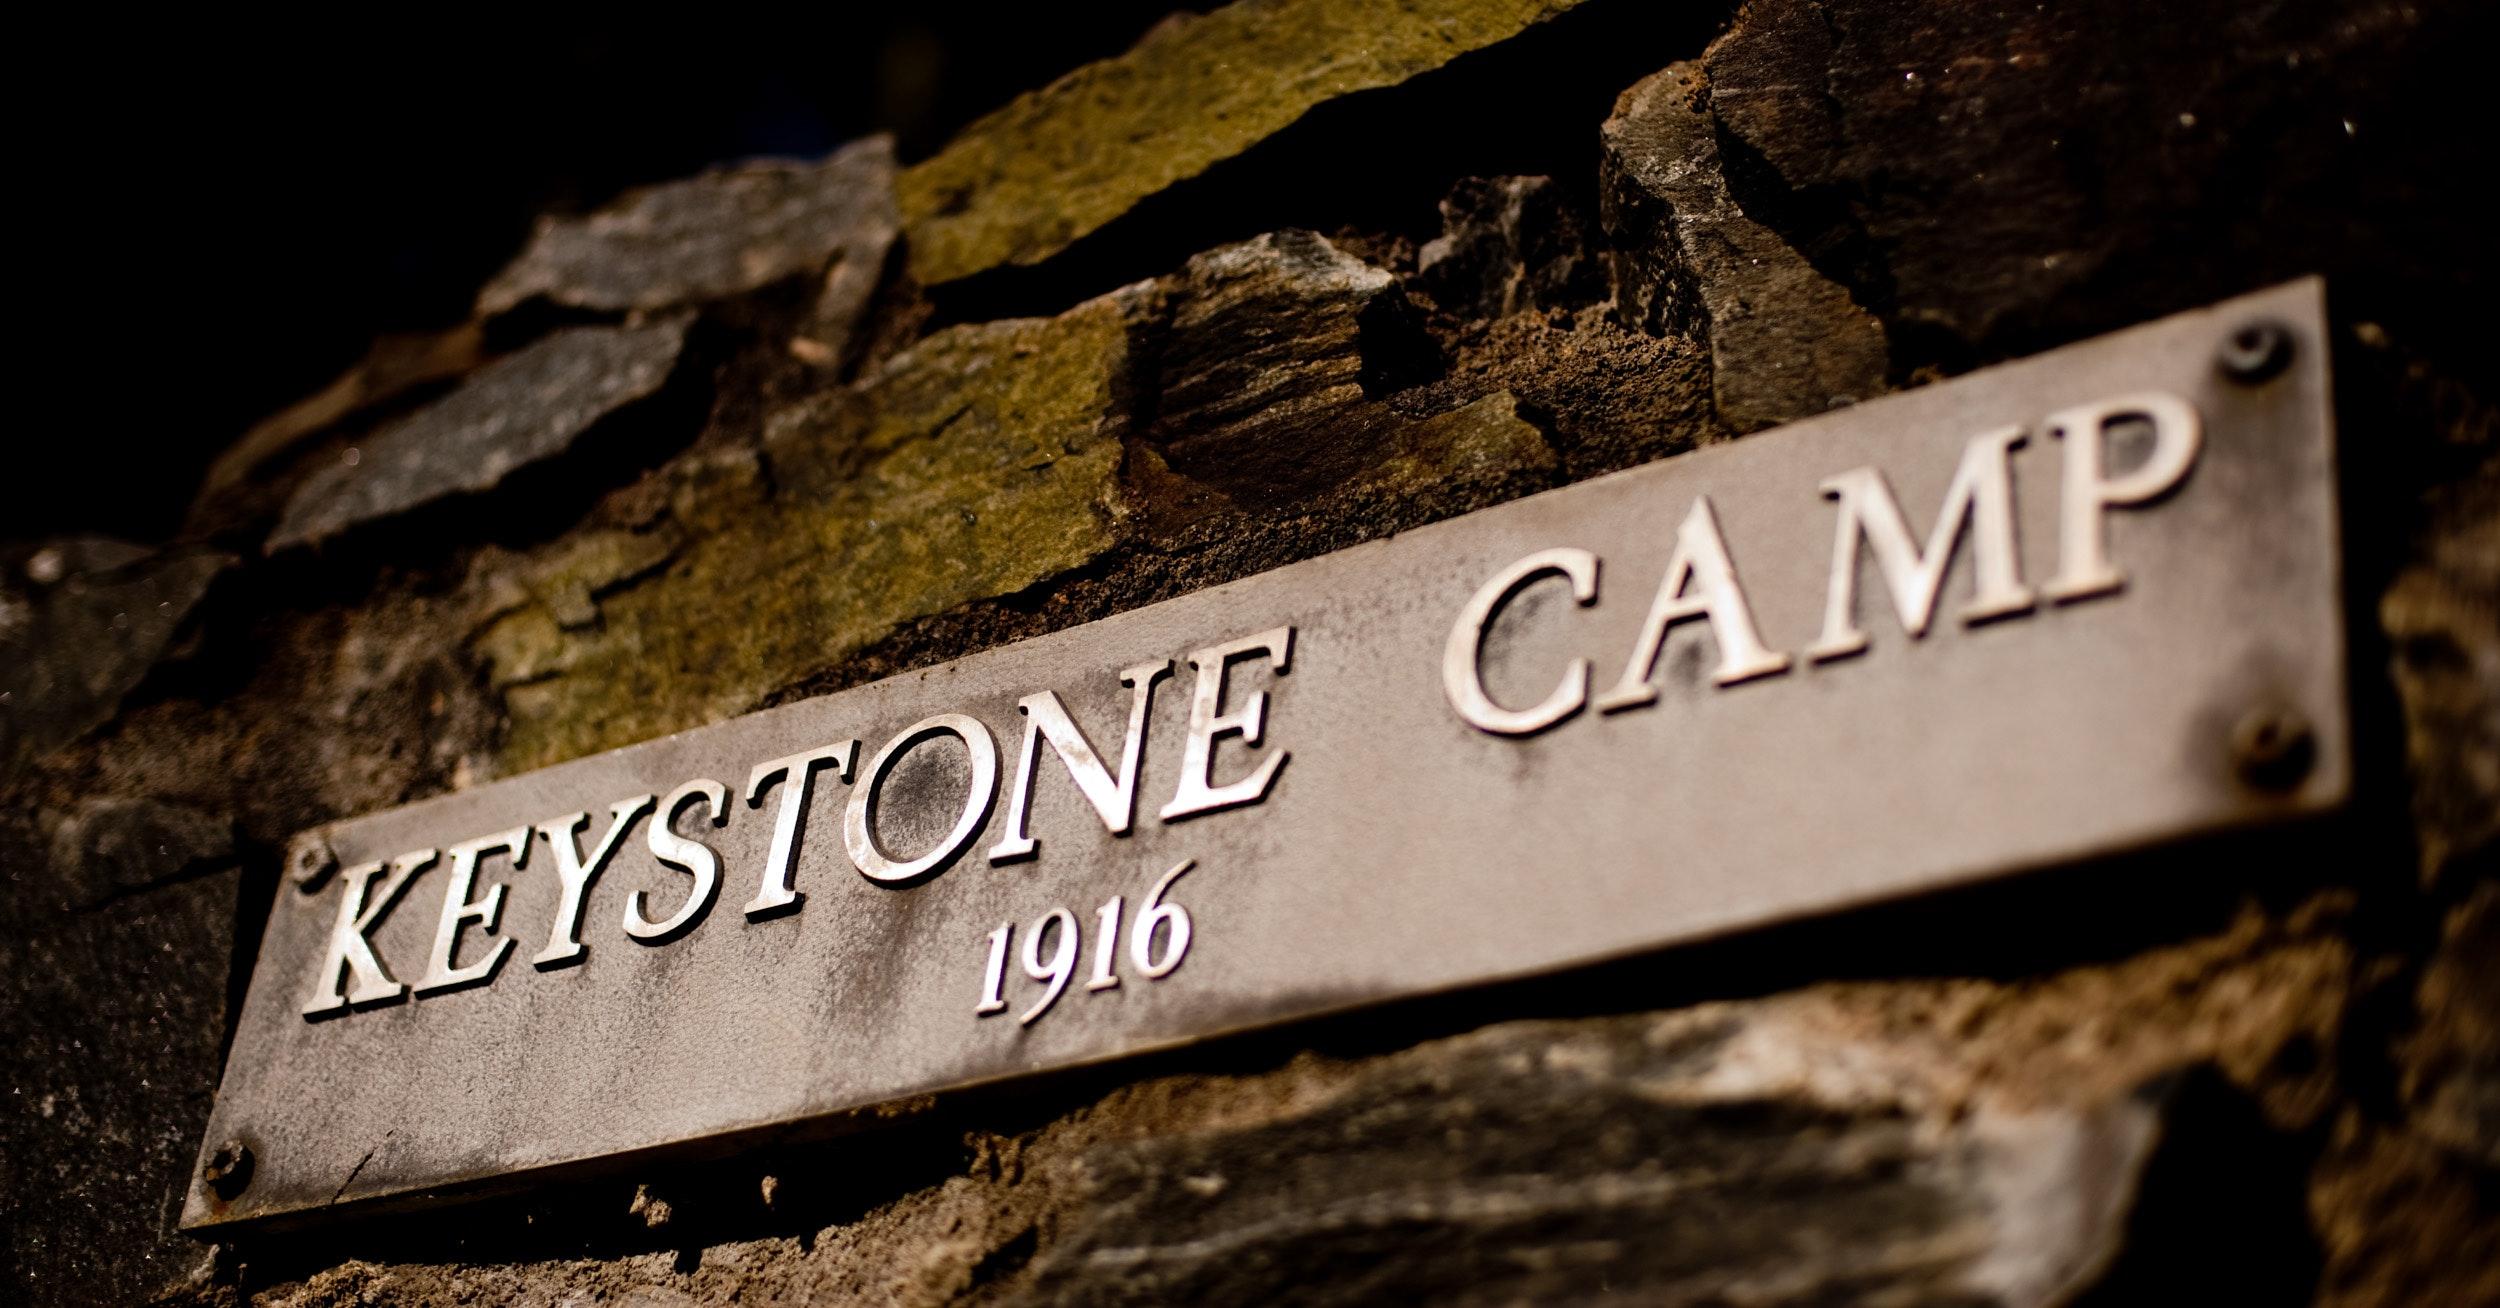 In the news at keystone summer camp for girls in brevard north carolina.jpg?ixlib=rails 2.1